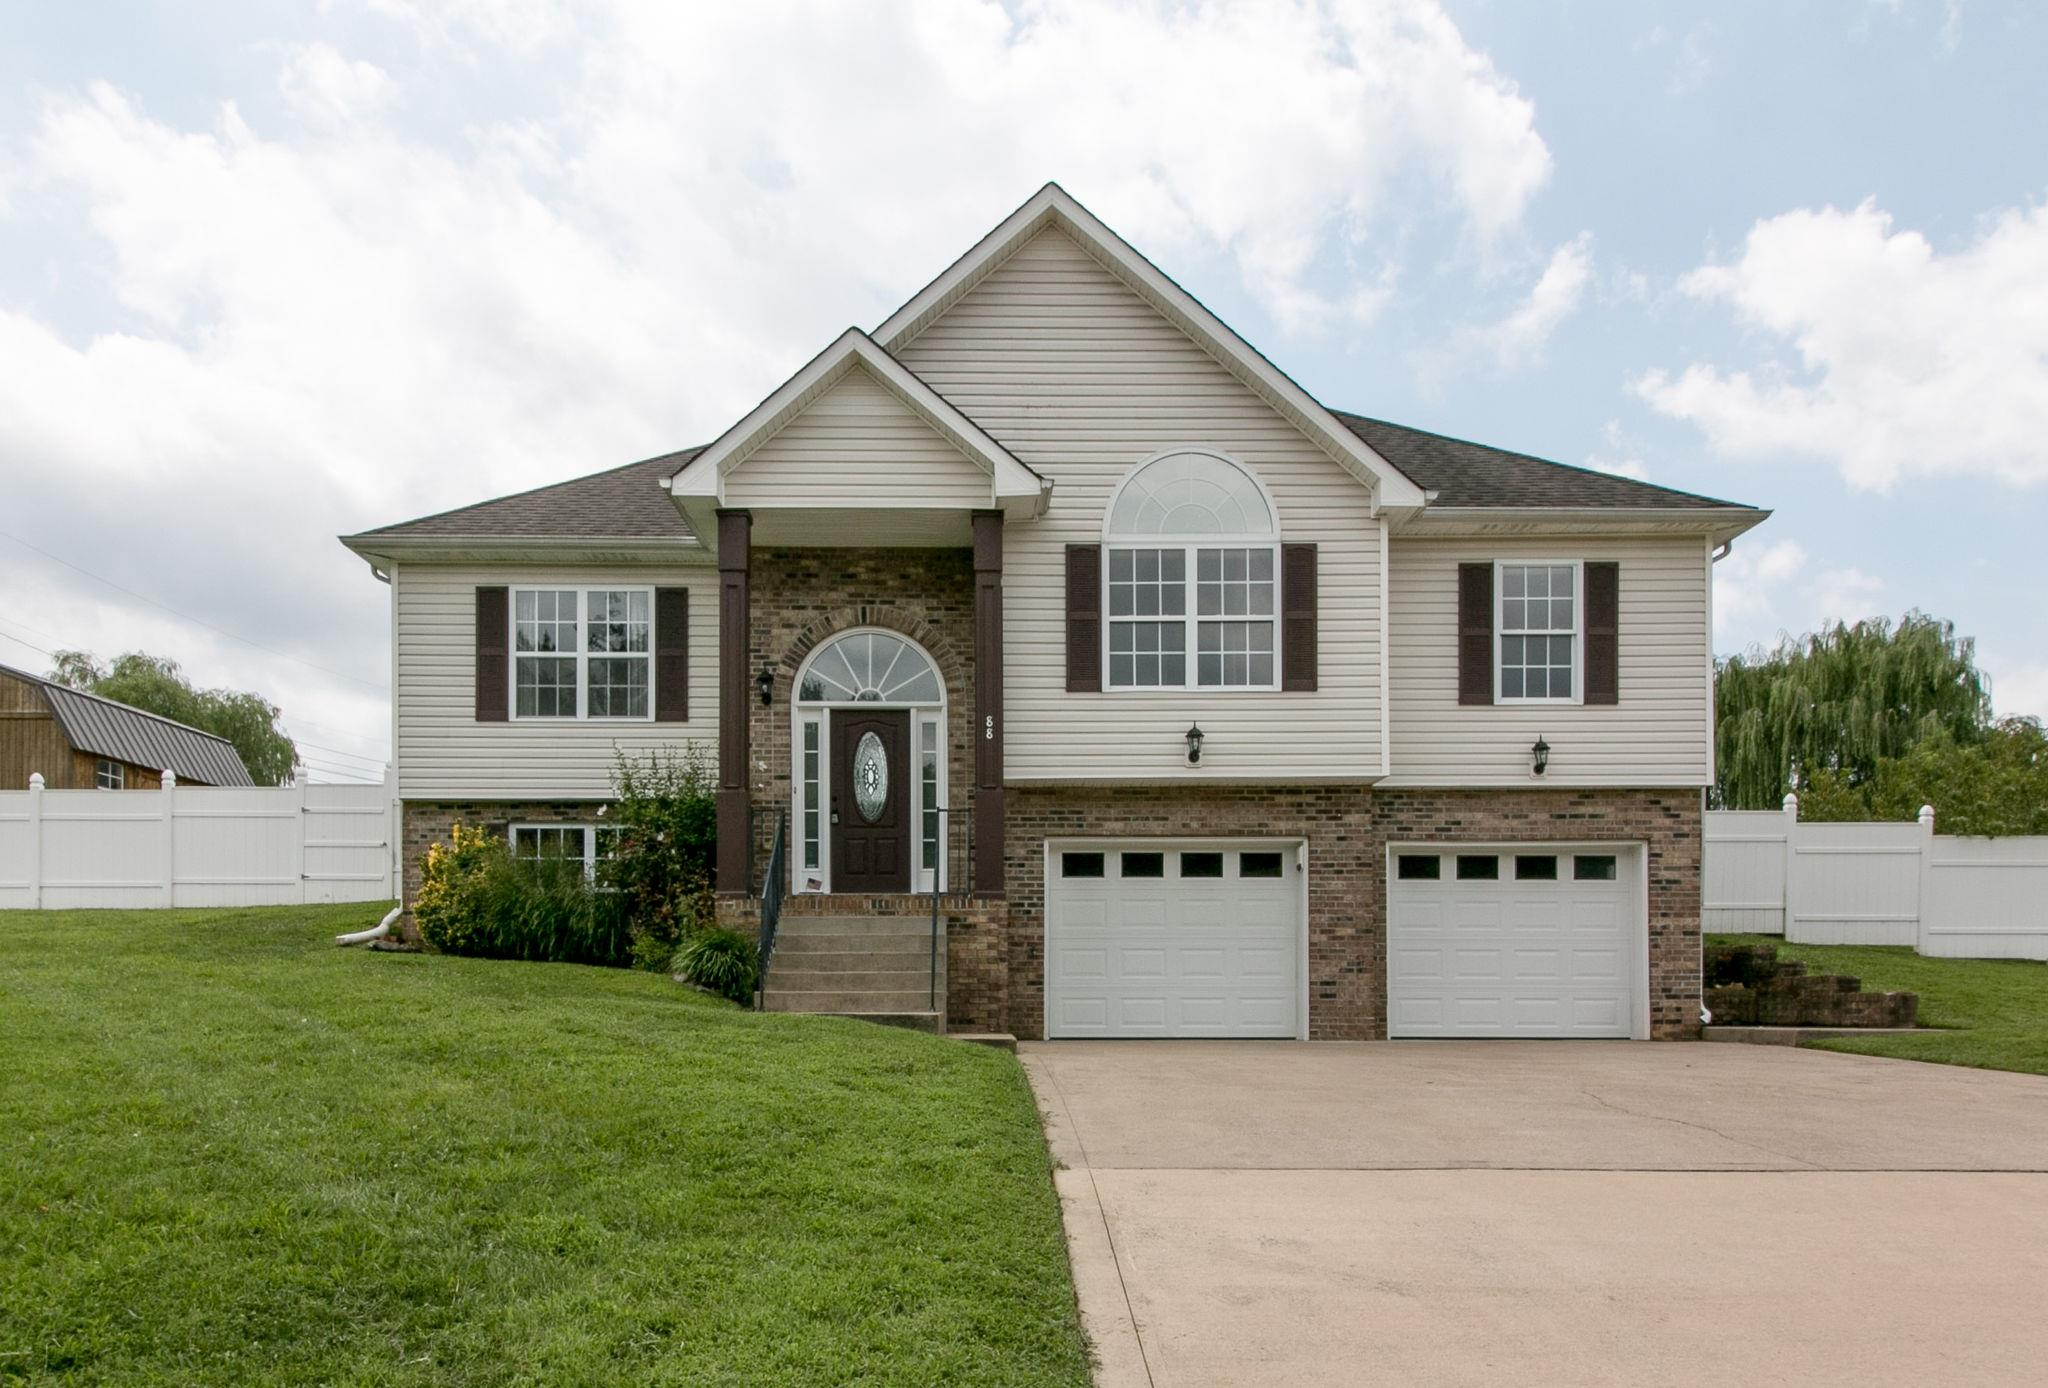 88 West Drive, Clarksville, TN 37040 - Clarksville, TN real estate listing